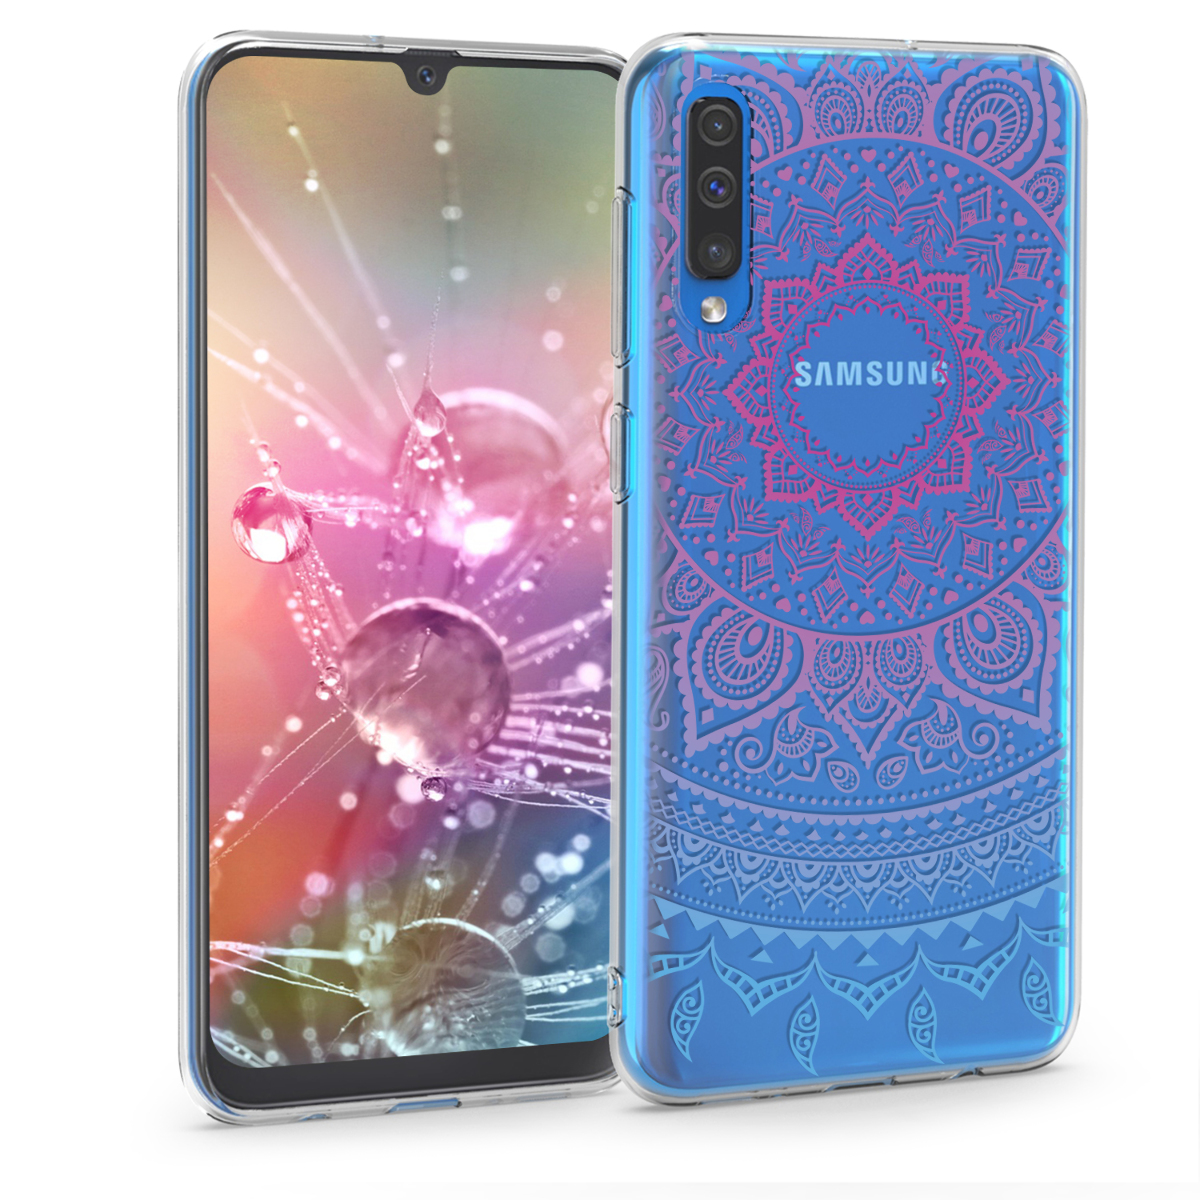 KW Θήκη Σιλικόνης Samsung Galaxy A50 - Blue / Dark Pink / Transparent (48060.03)